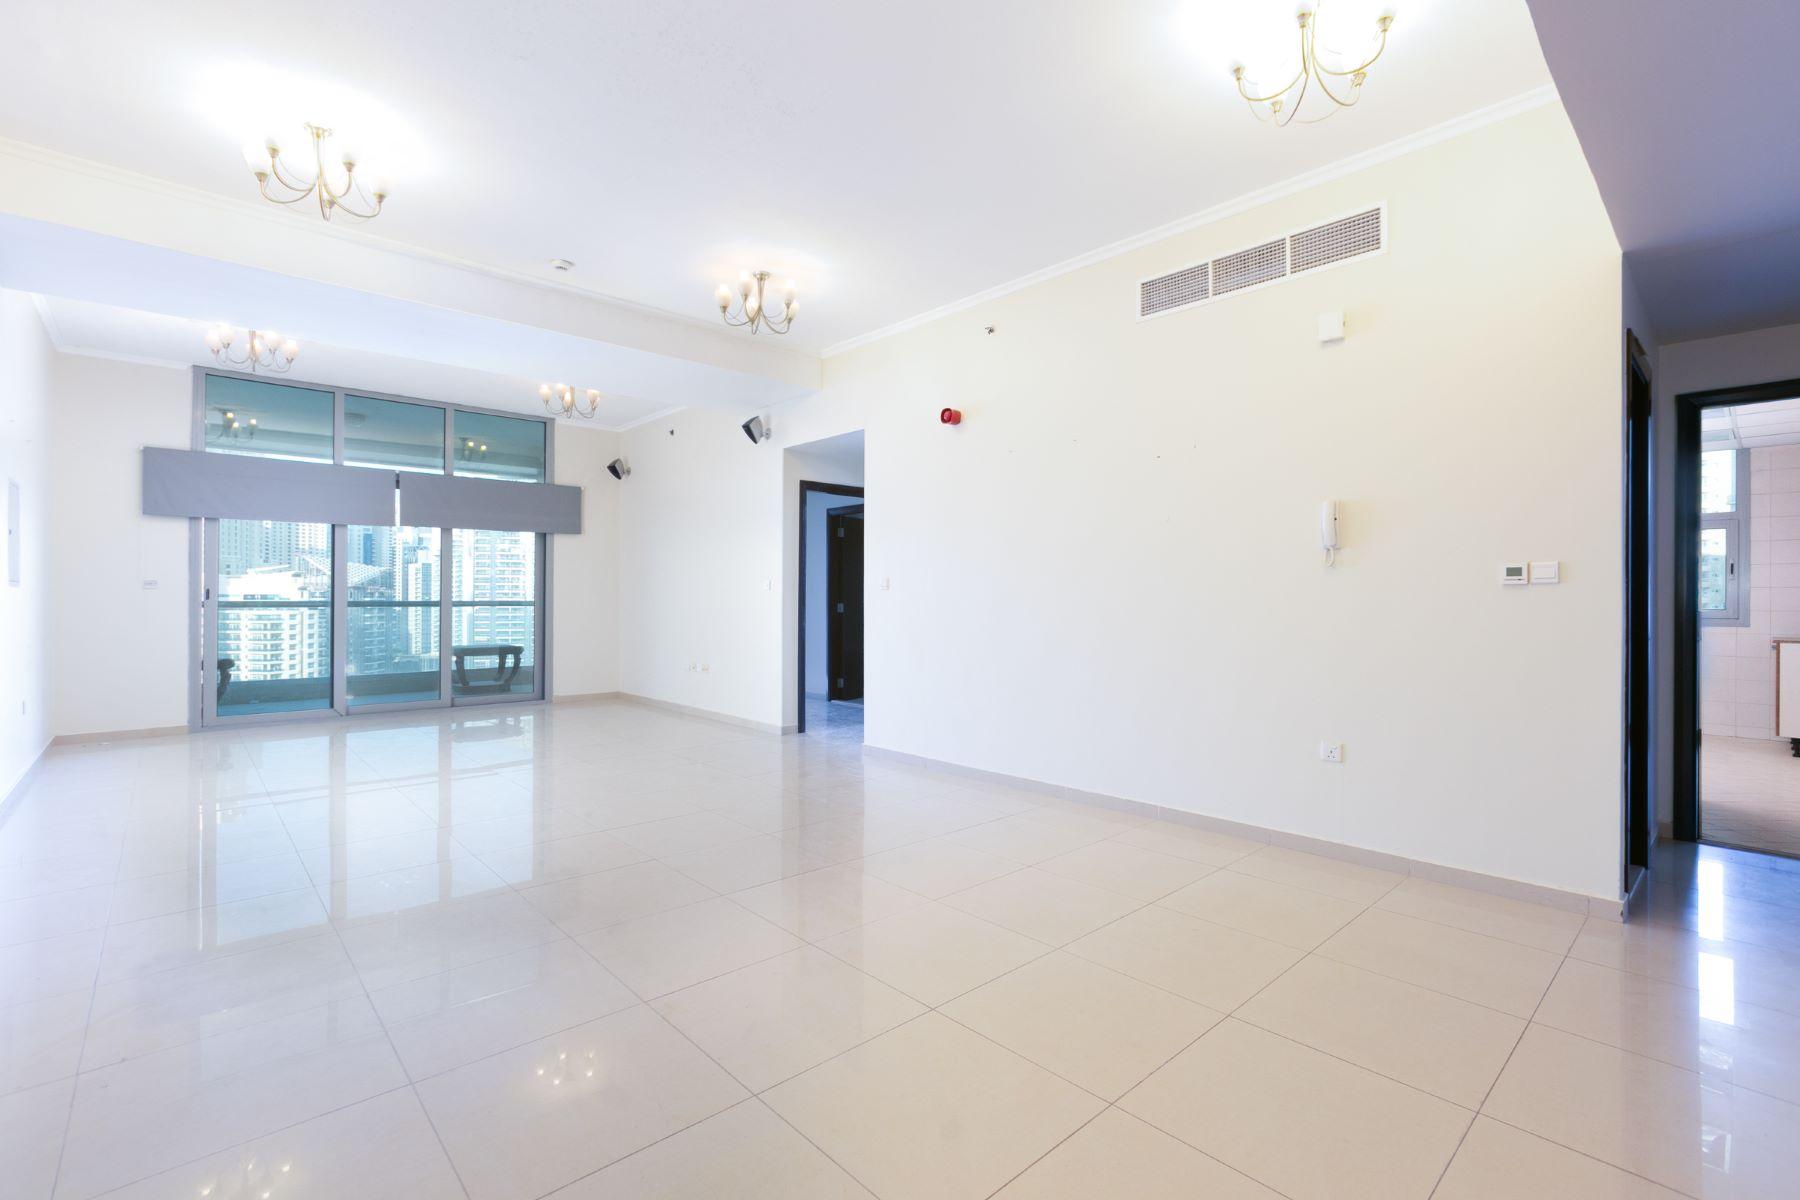 Apartments for Sale at 2 Bedroom Marina View Unfurnished Dubai, Dubai United Arab Emirates